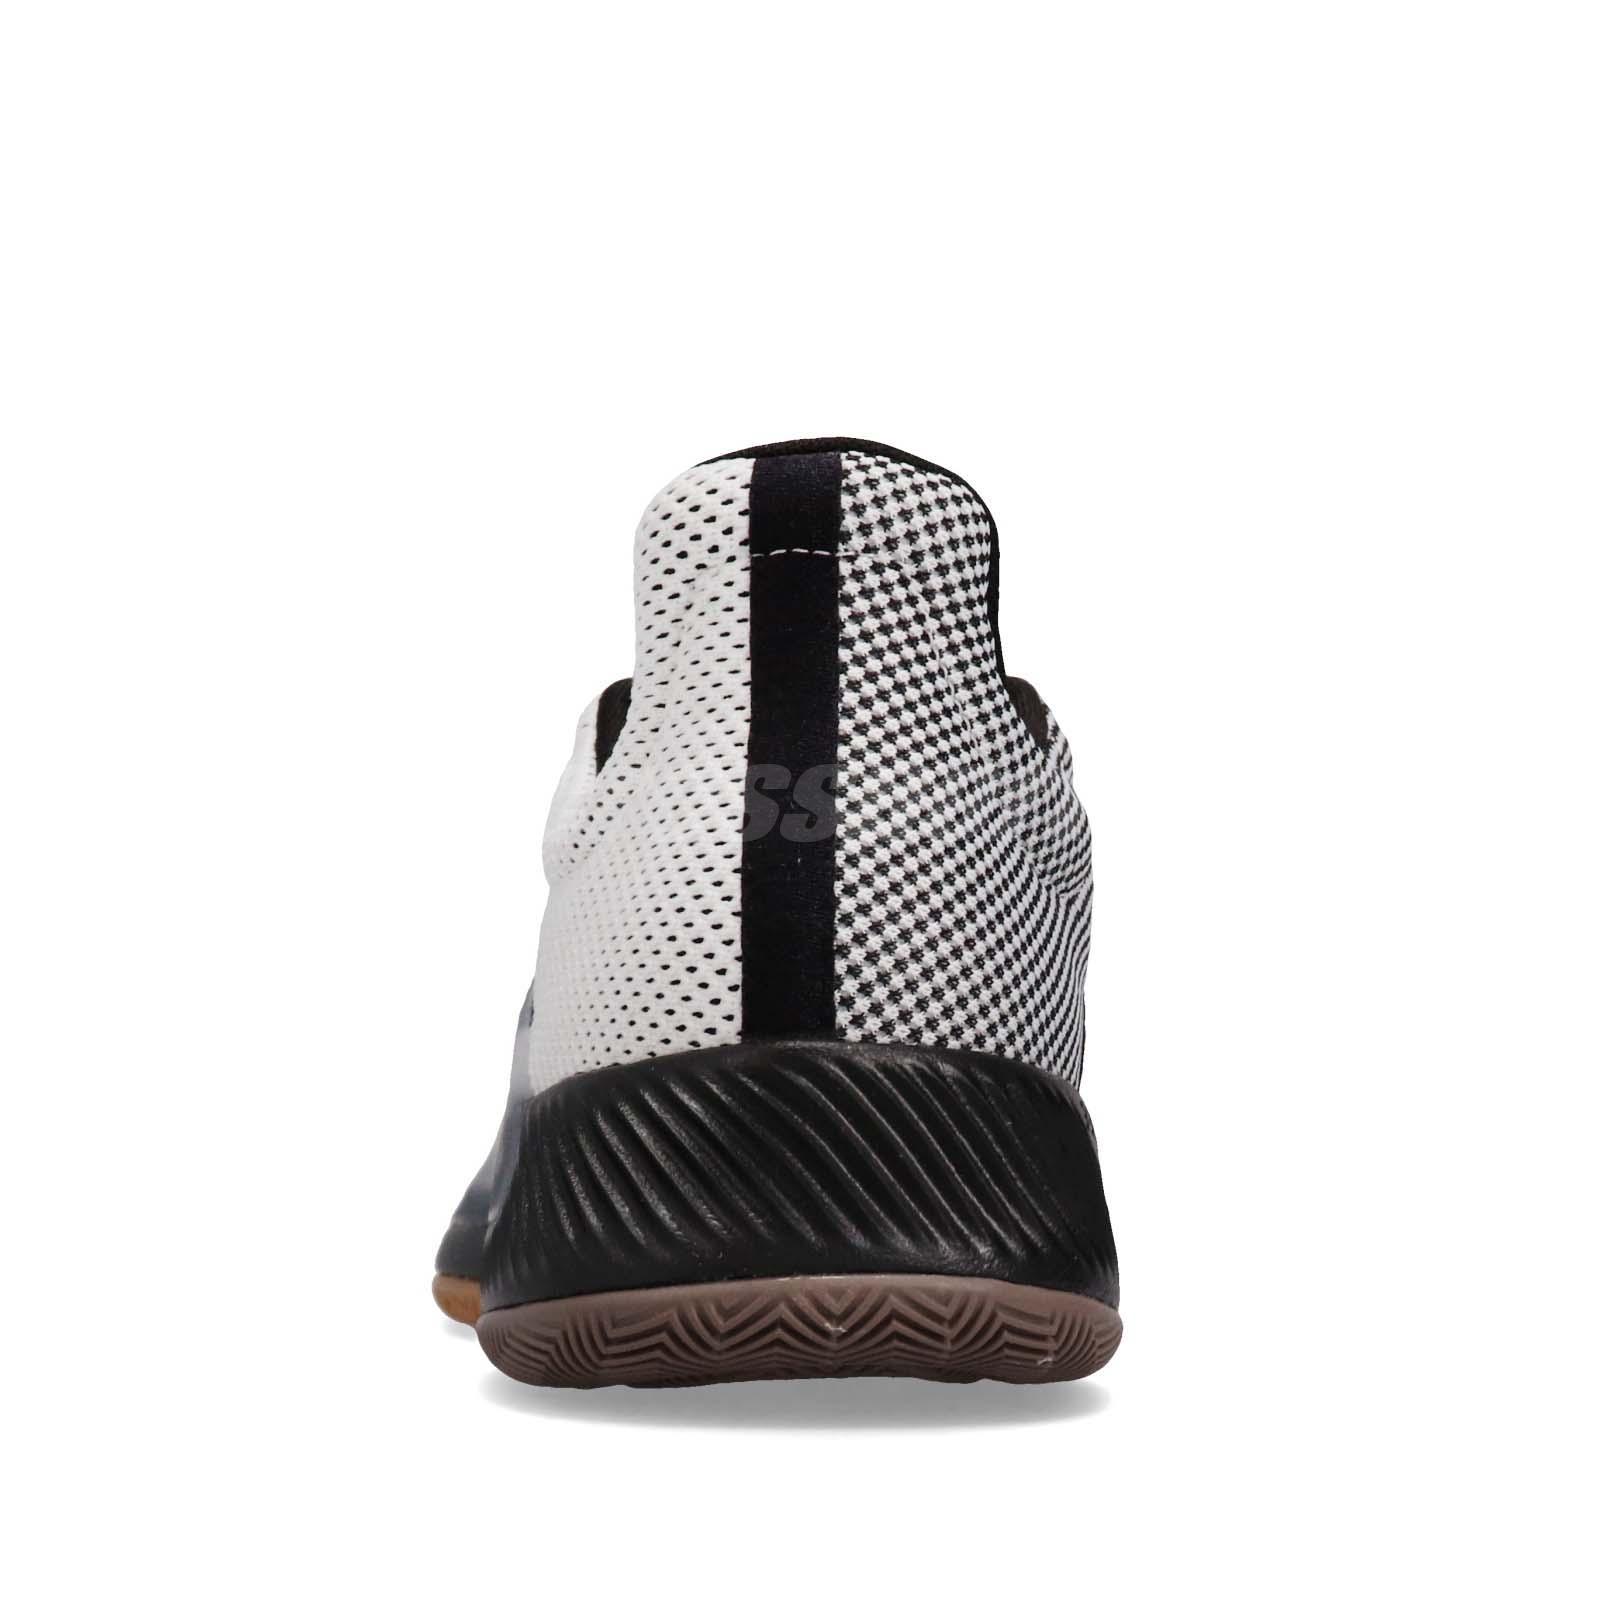 dd3310fcbf88 adidas Pro Bounce Madness Low 2019 Black White Gum Men Basketball ...